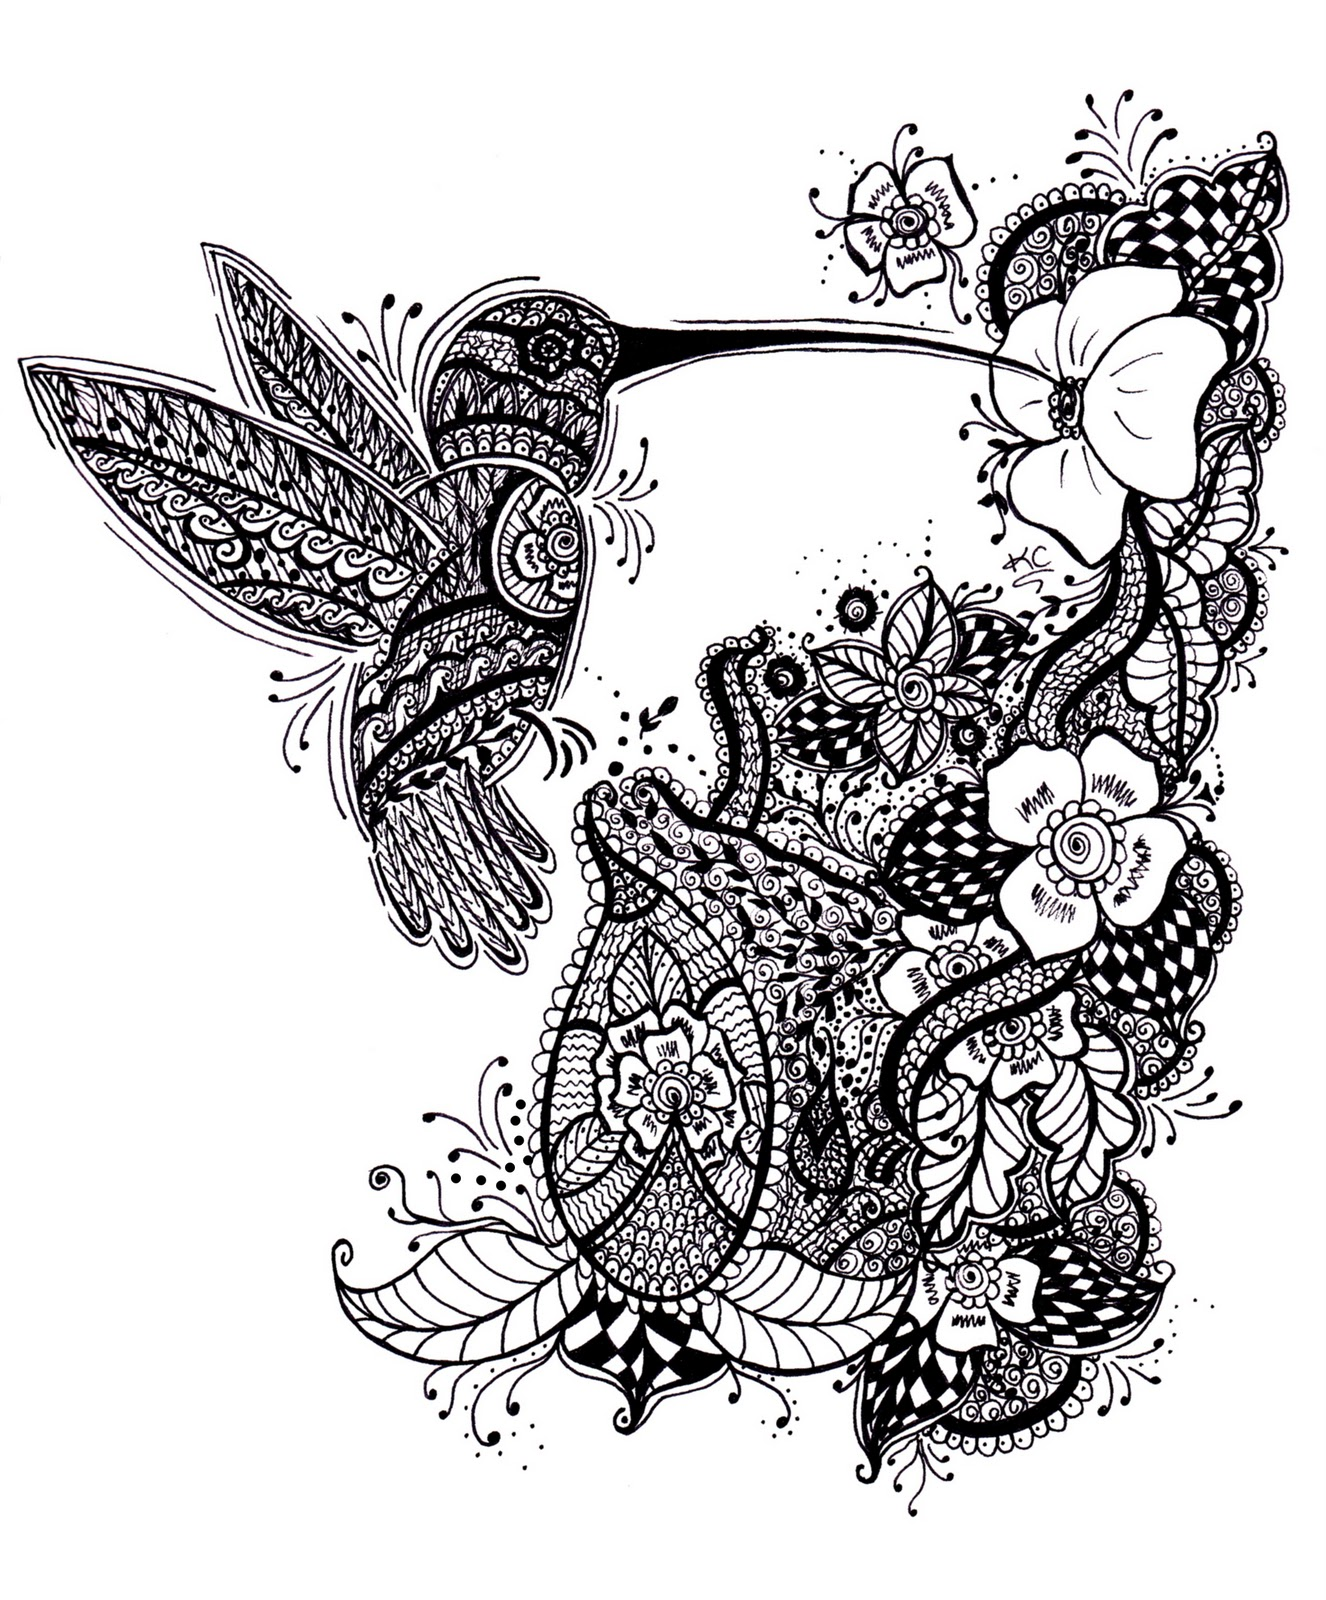 Bird Henna Tattoo Designs: Tattoos Of Humming Bird: Hummingbird Tattoo Black And White